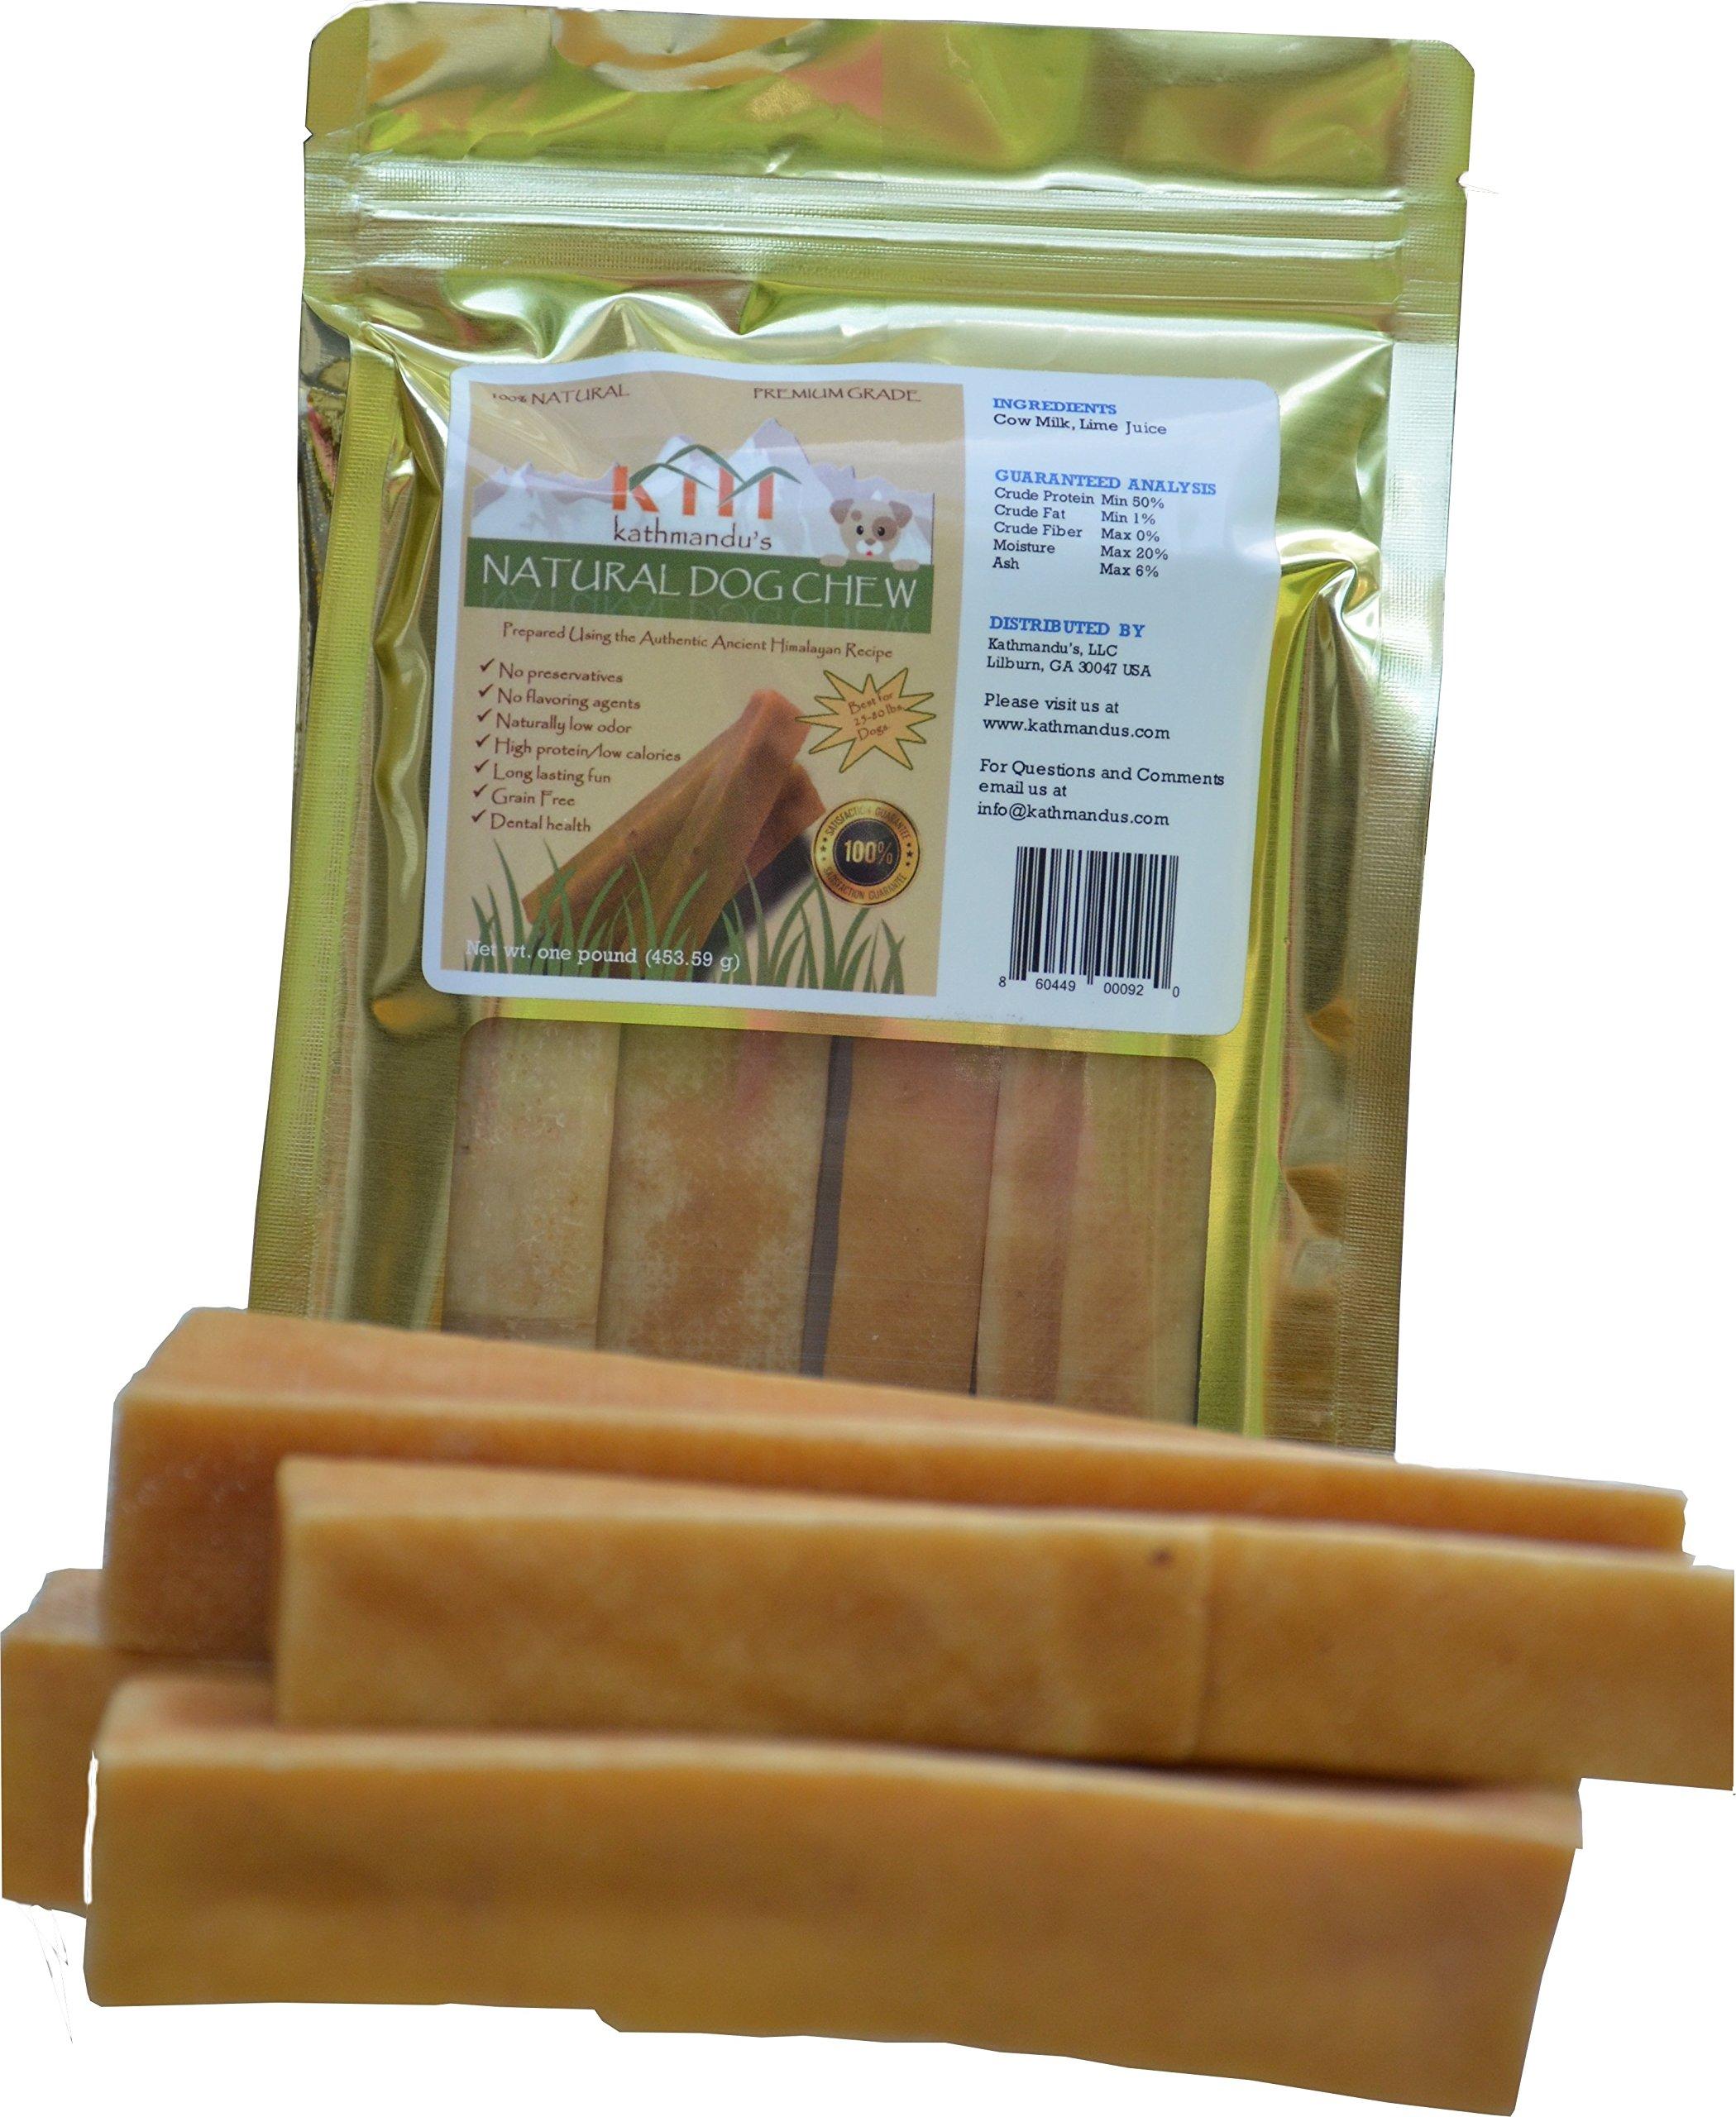 Kathmandu's Natural Dog Chew, Longlasting Fun, Odorless, Splinterless, Smoked Hard Cheese Dog Treat from Pristine Himalayan Foothill, Proudly Packaged in Georgia USA, small, medium, large, xlarge, xxl